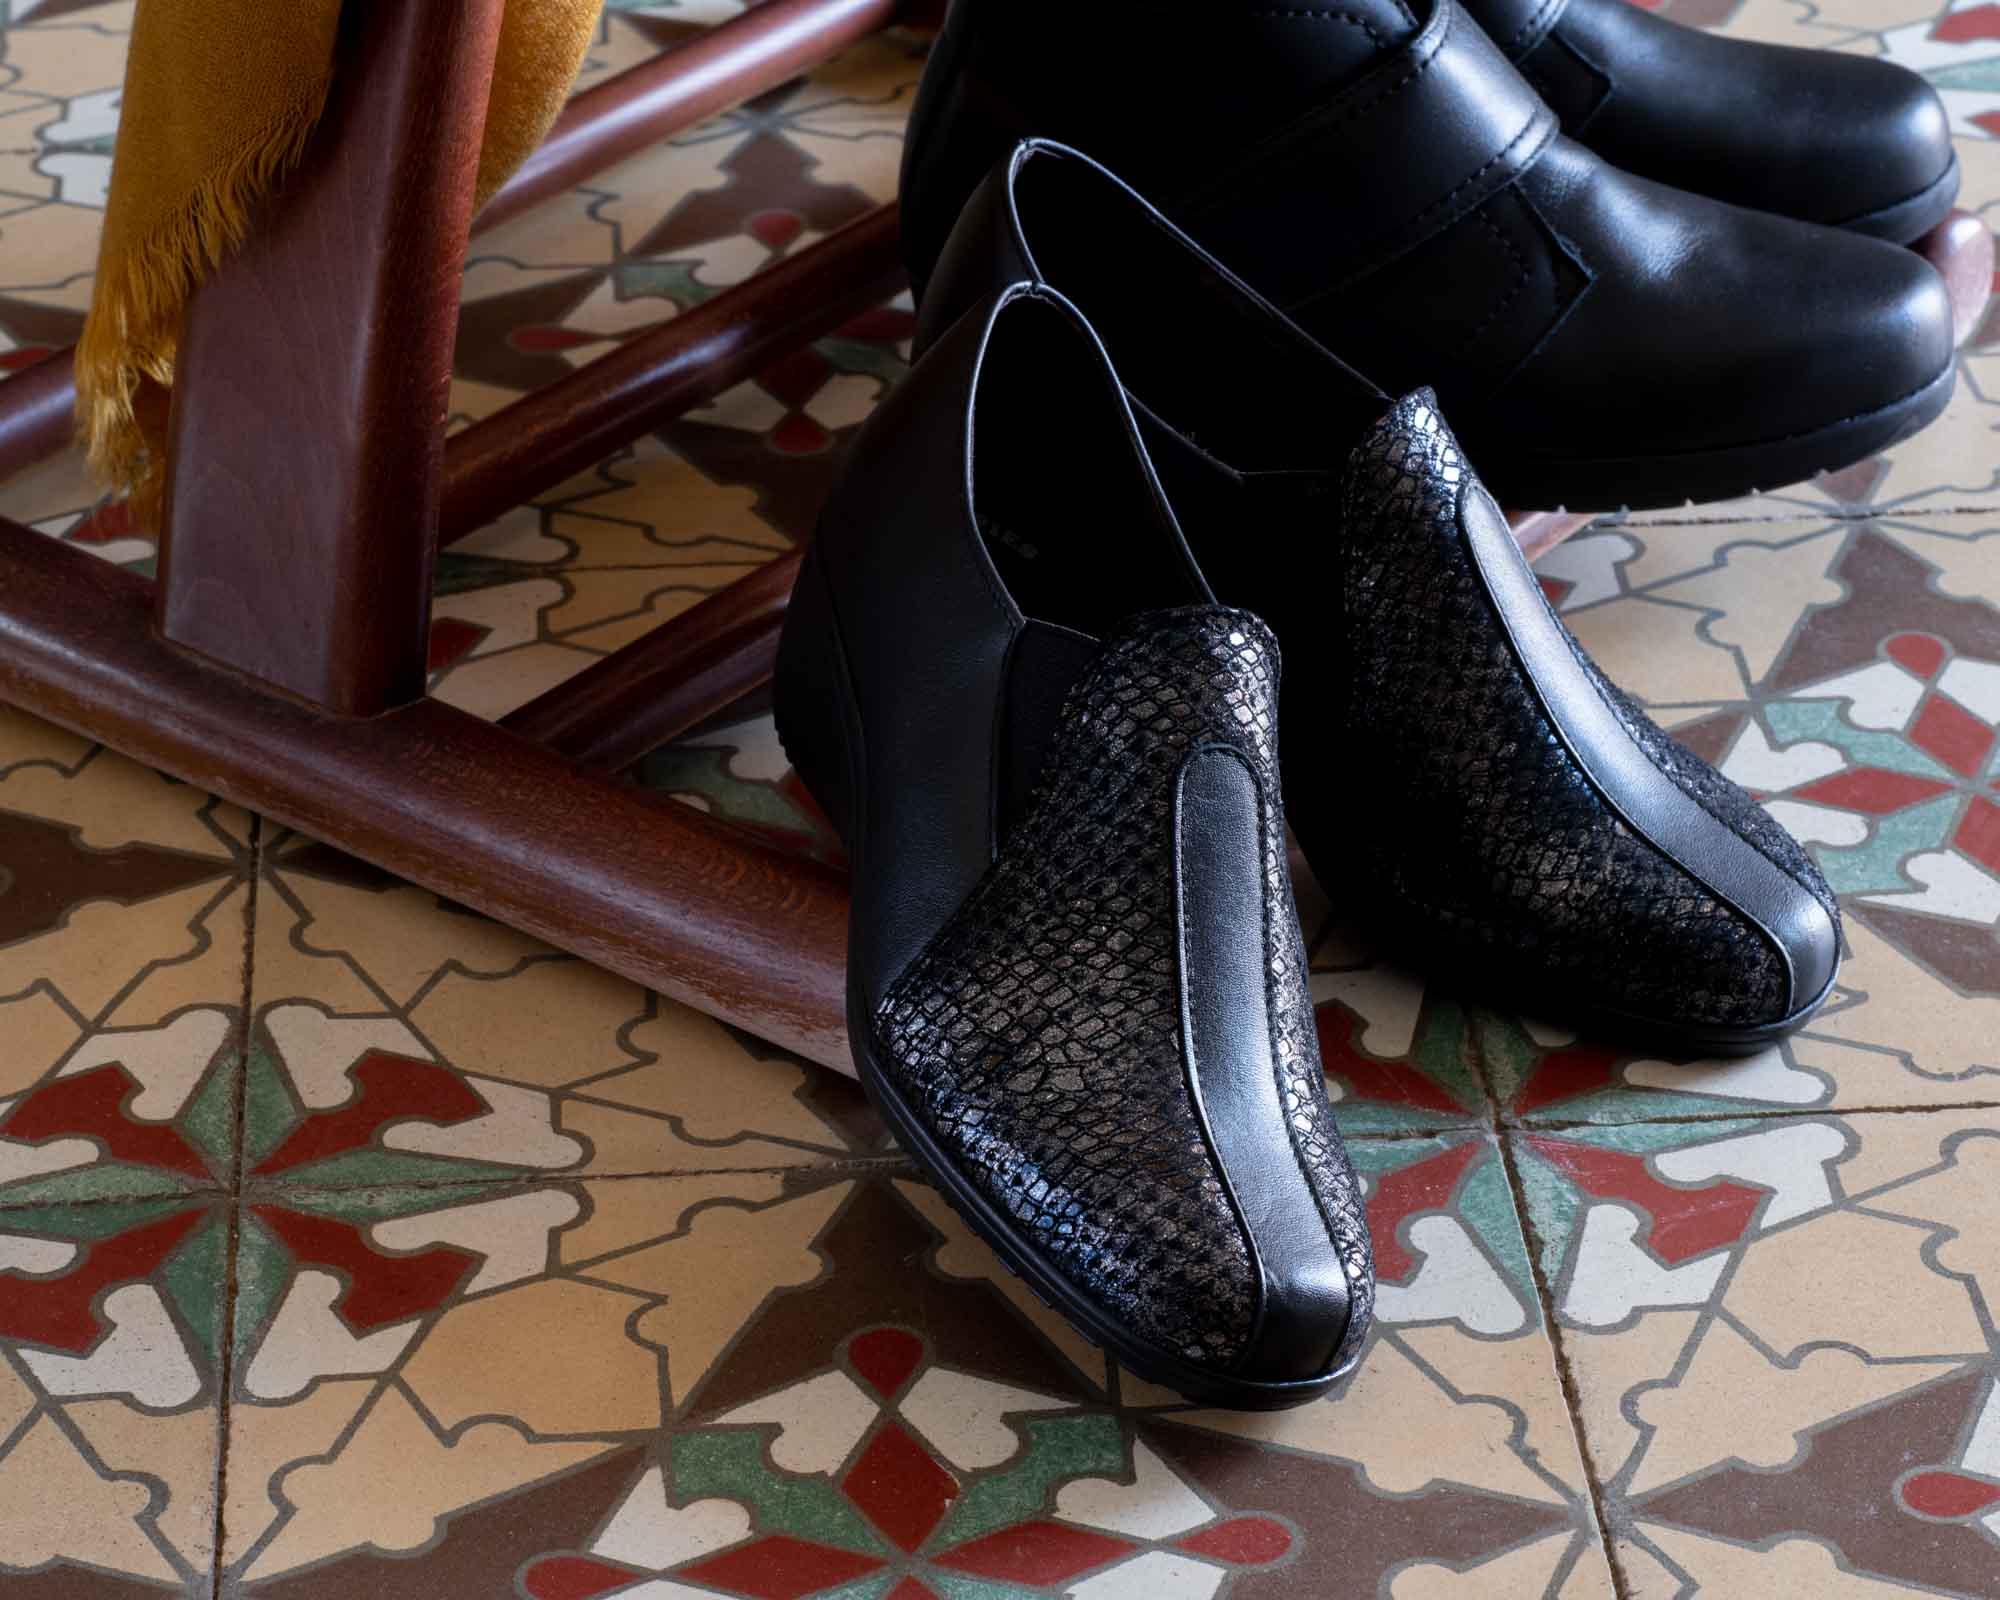 Dos pares de zapatos de otoño oscuro sobre baldosas marrones español